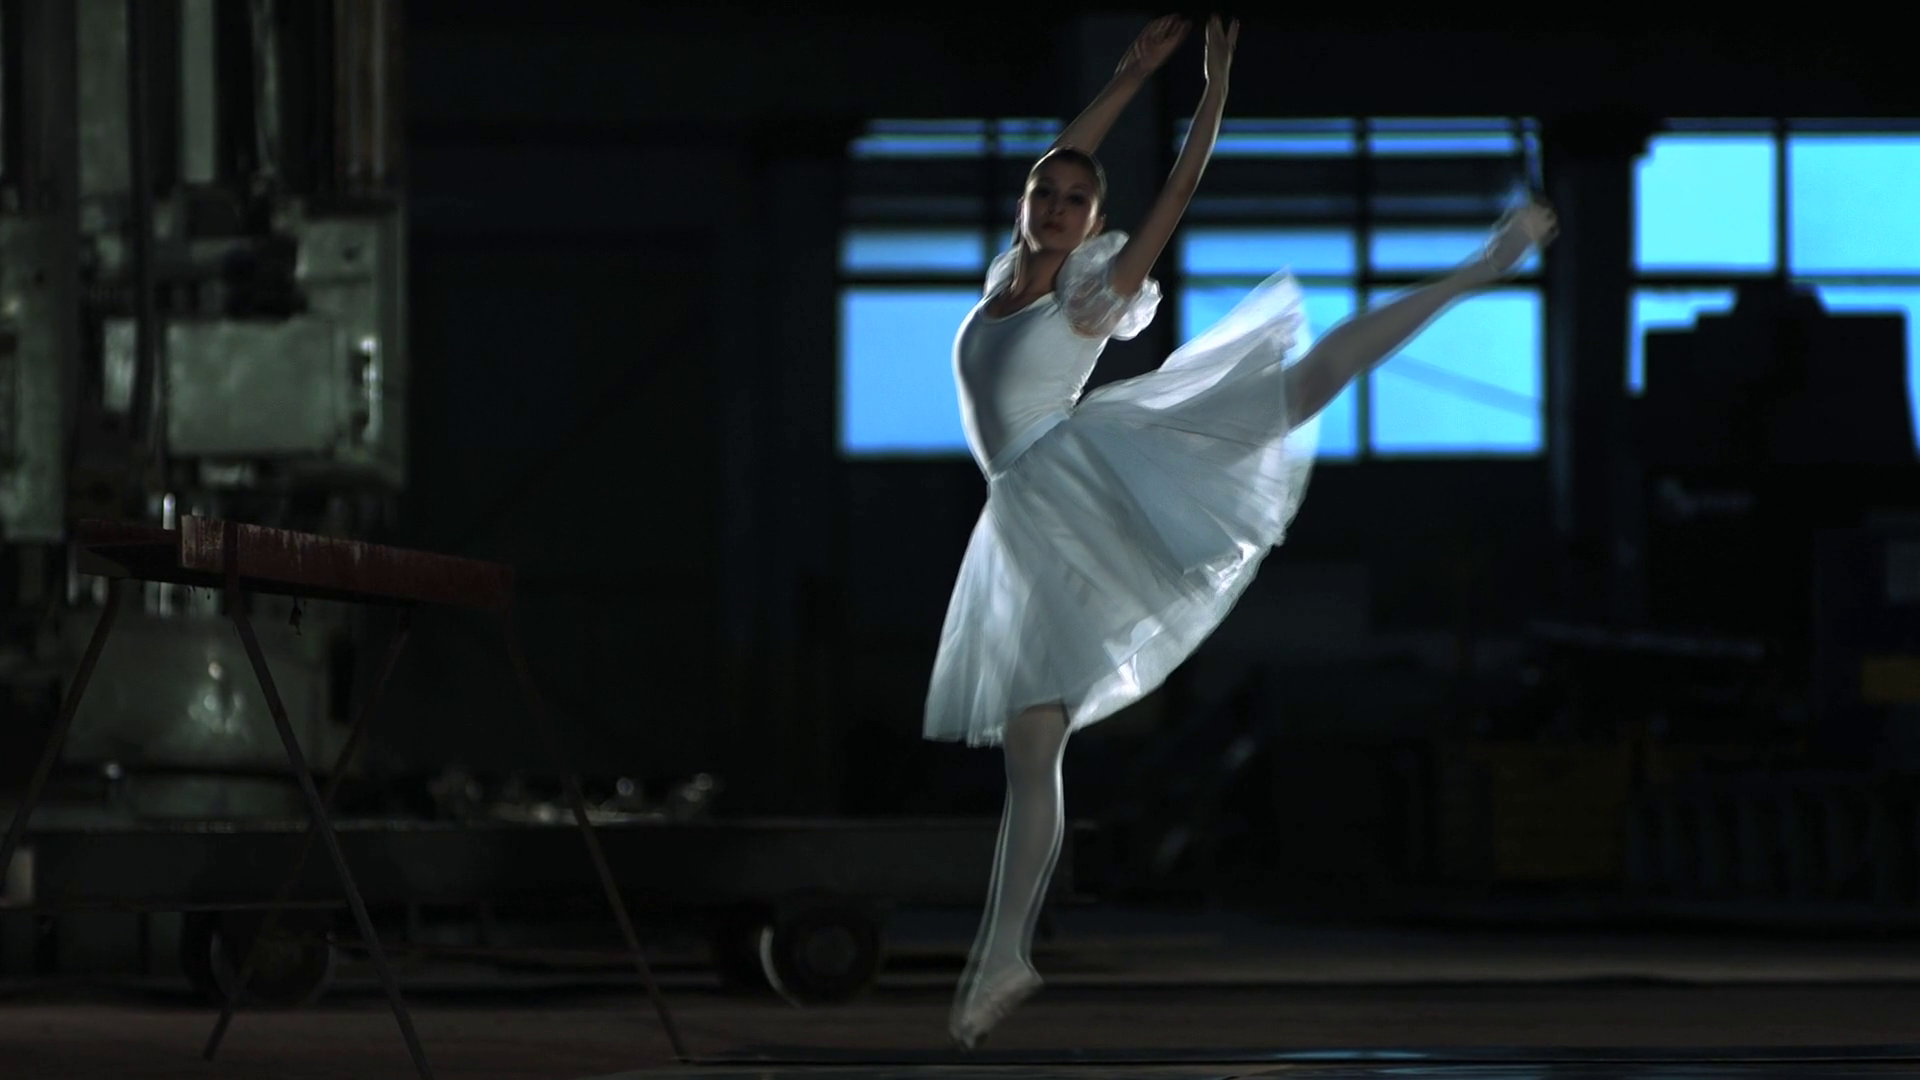 Inna - Love (2009) HDTVRip 1080p | 60 fps от Kamikkadze